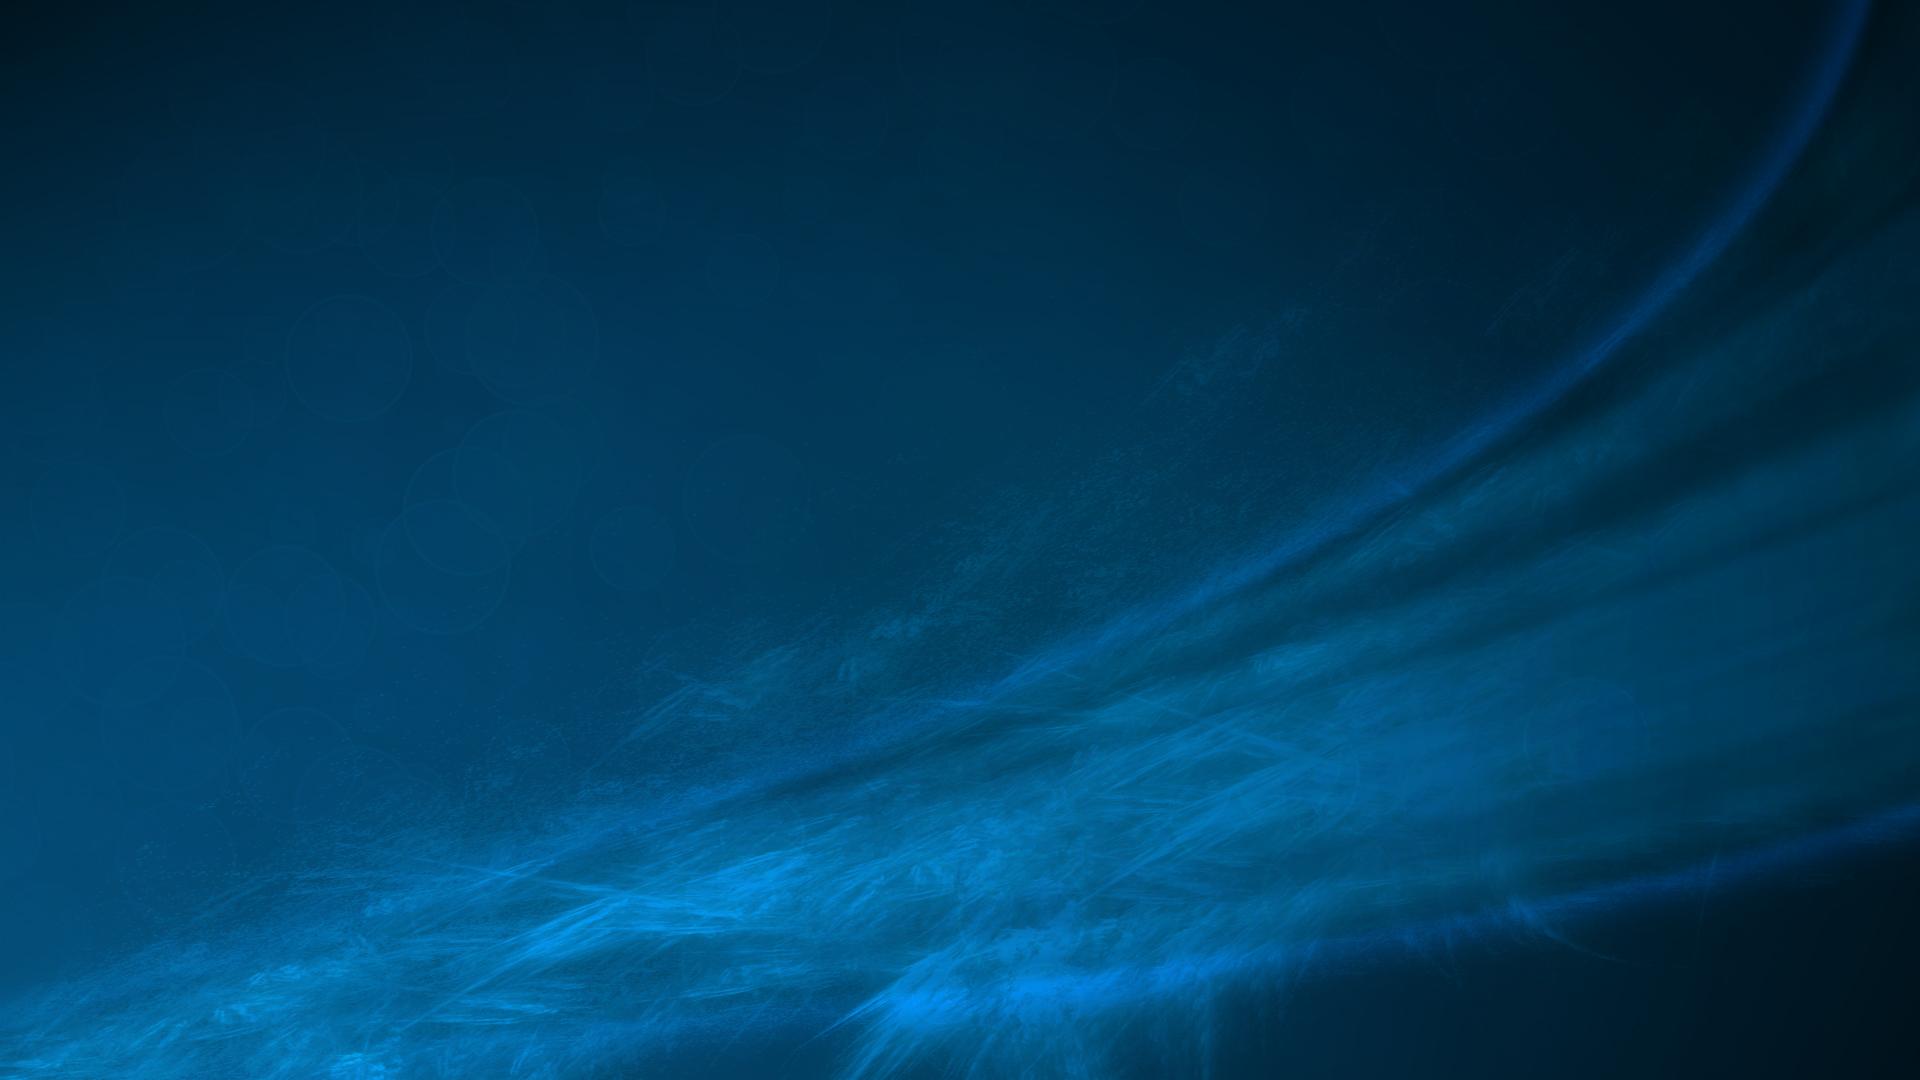 Blue Desktop Wallpaper by NIHILUSDESIGNS 1920x1080